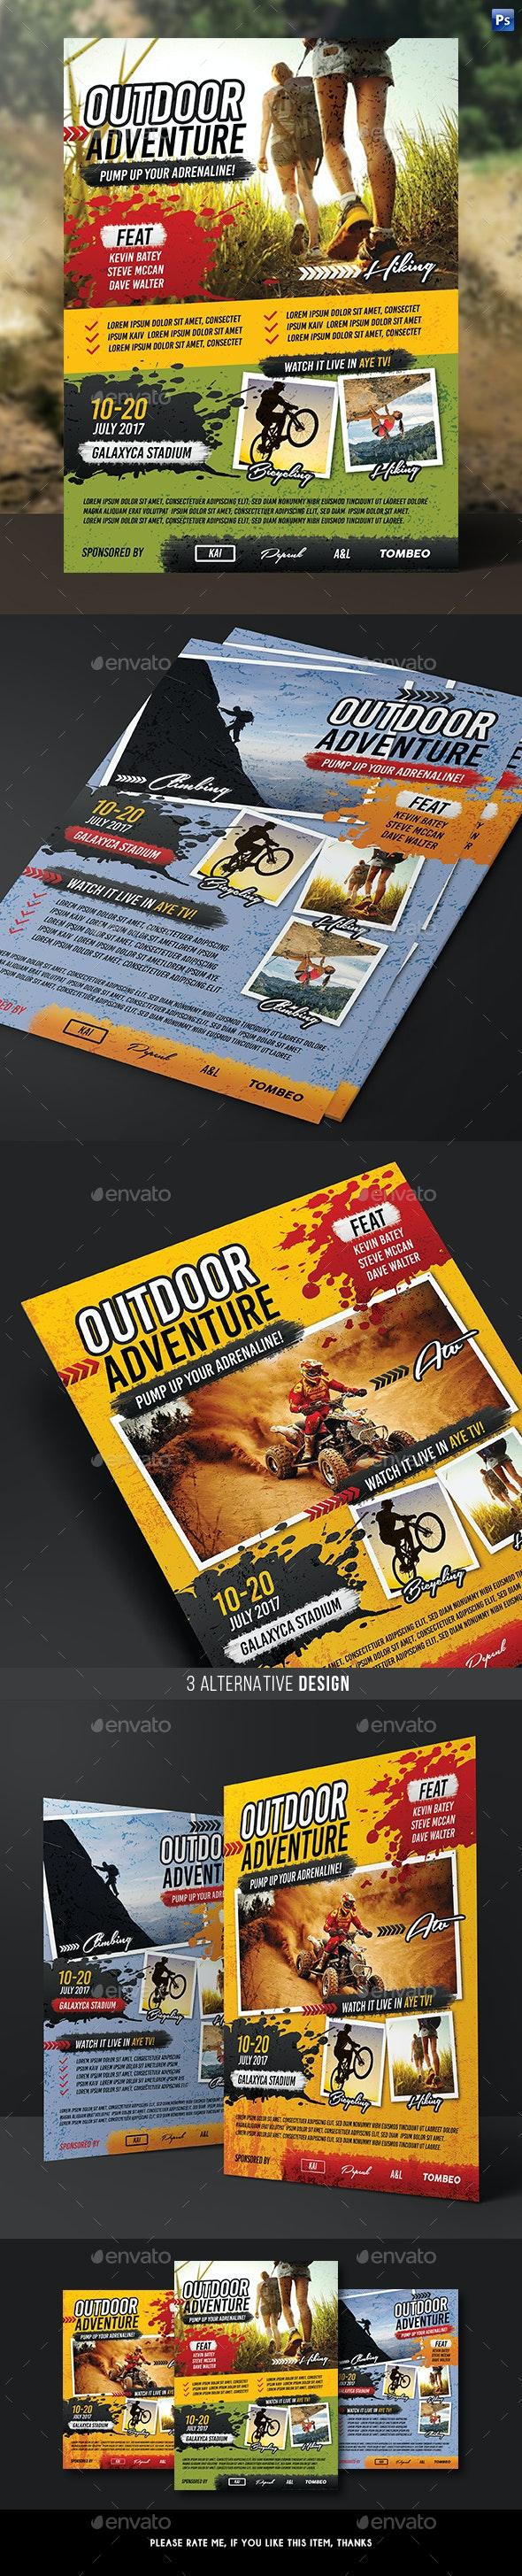 Outdoor Sport Adventure Flyer - Sports Events